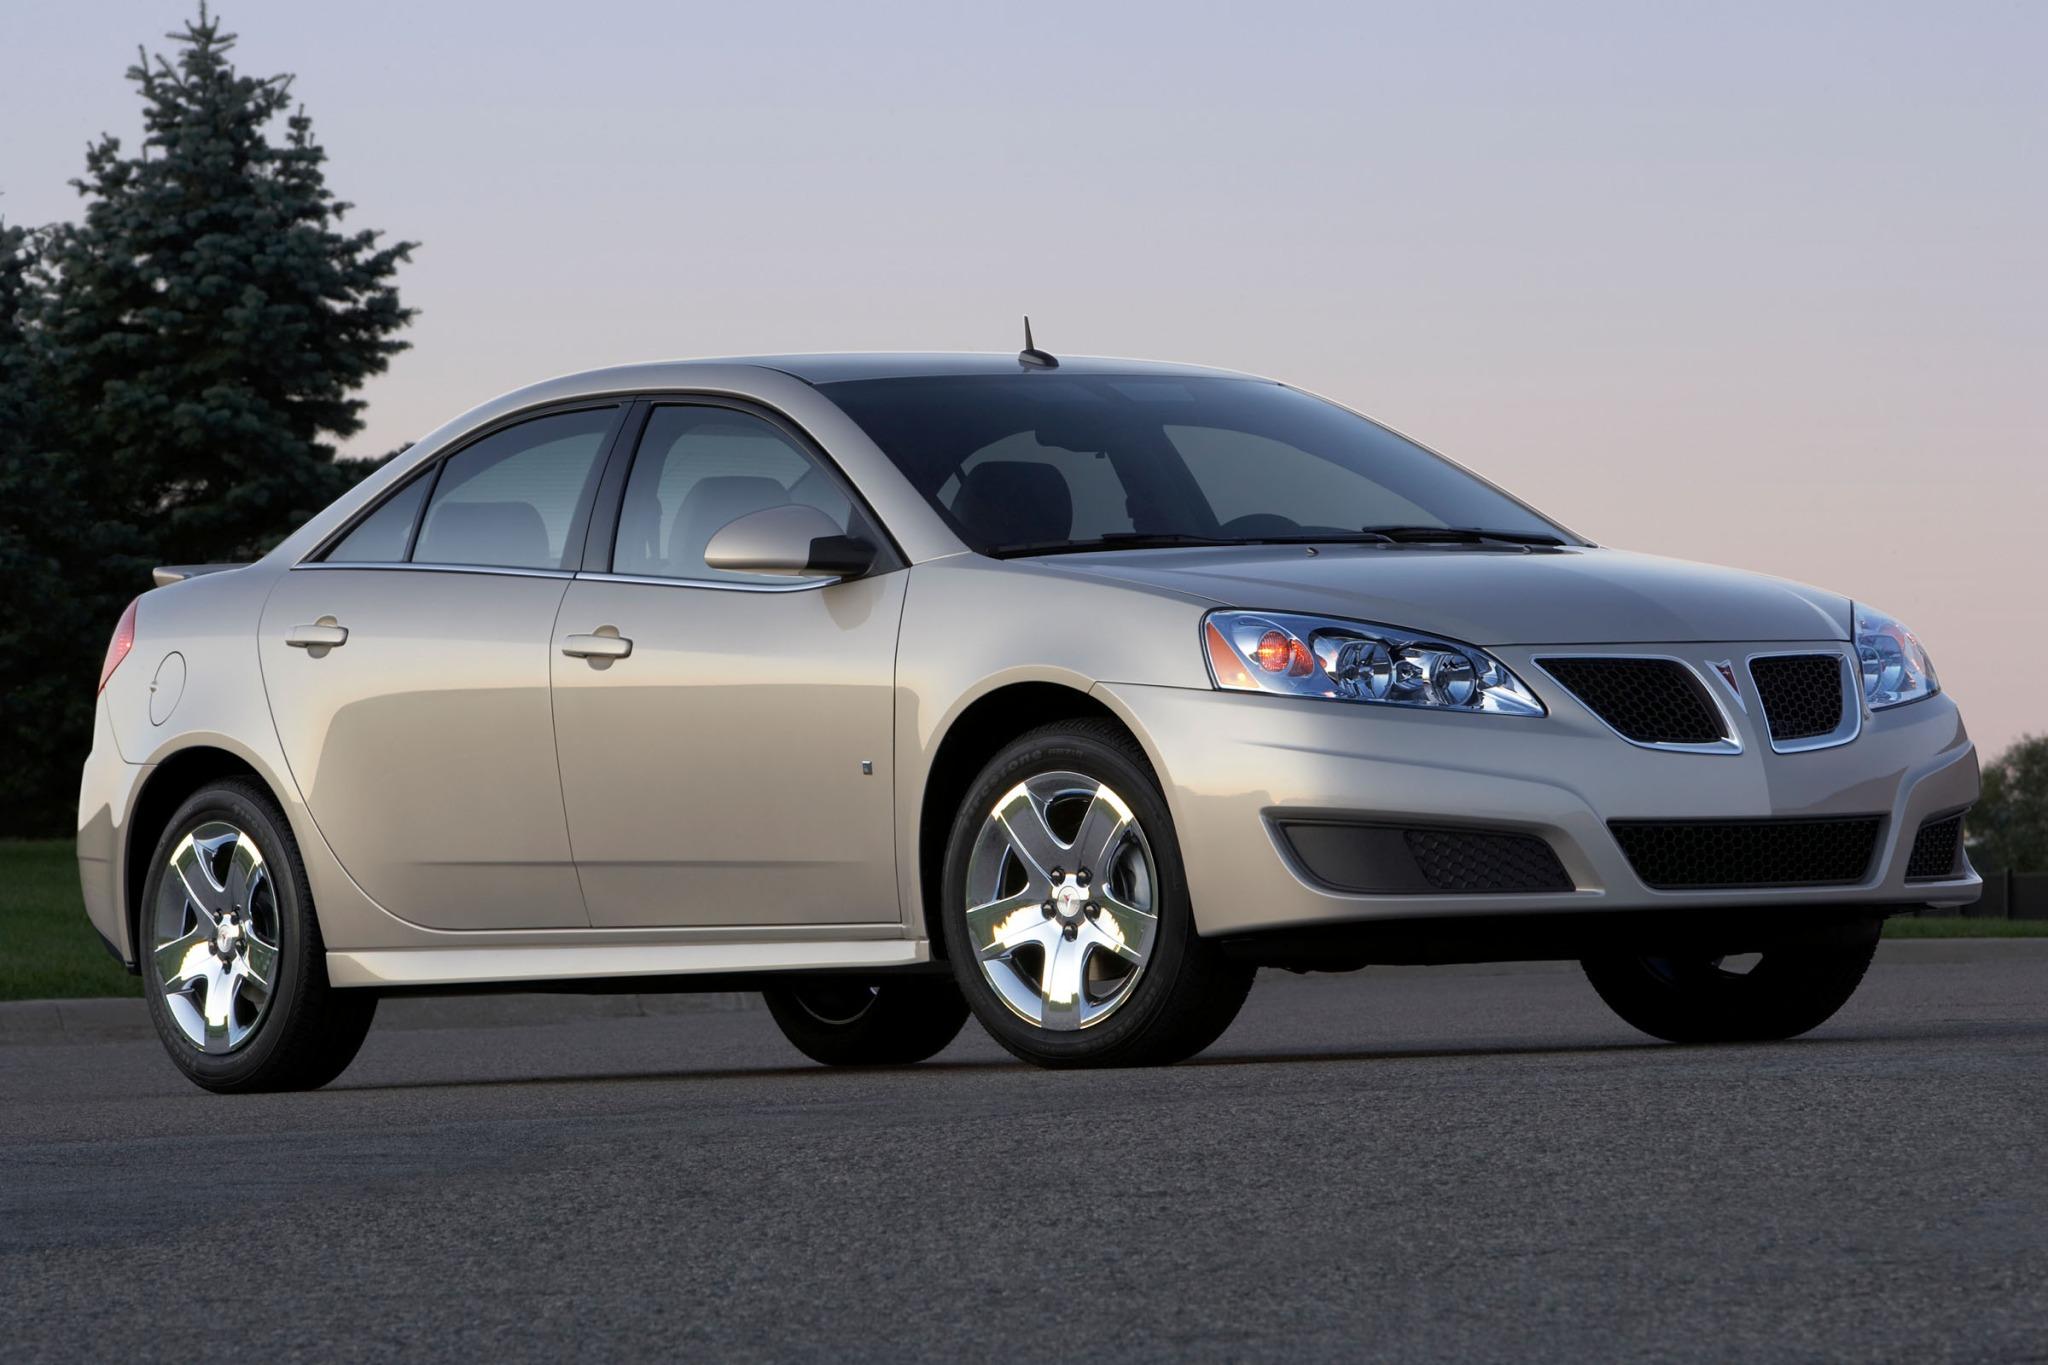 2010 pontiac g6 sedan fleet fq oem 1 2048